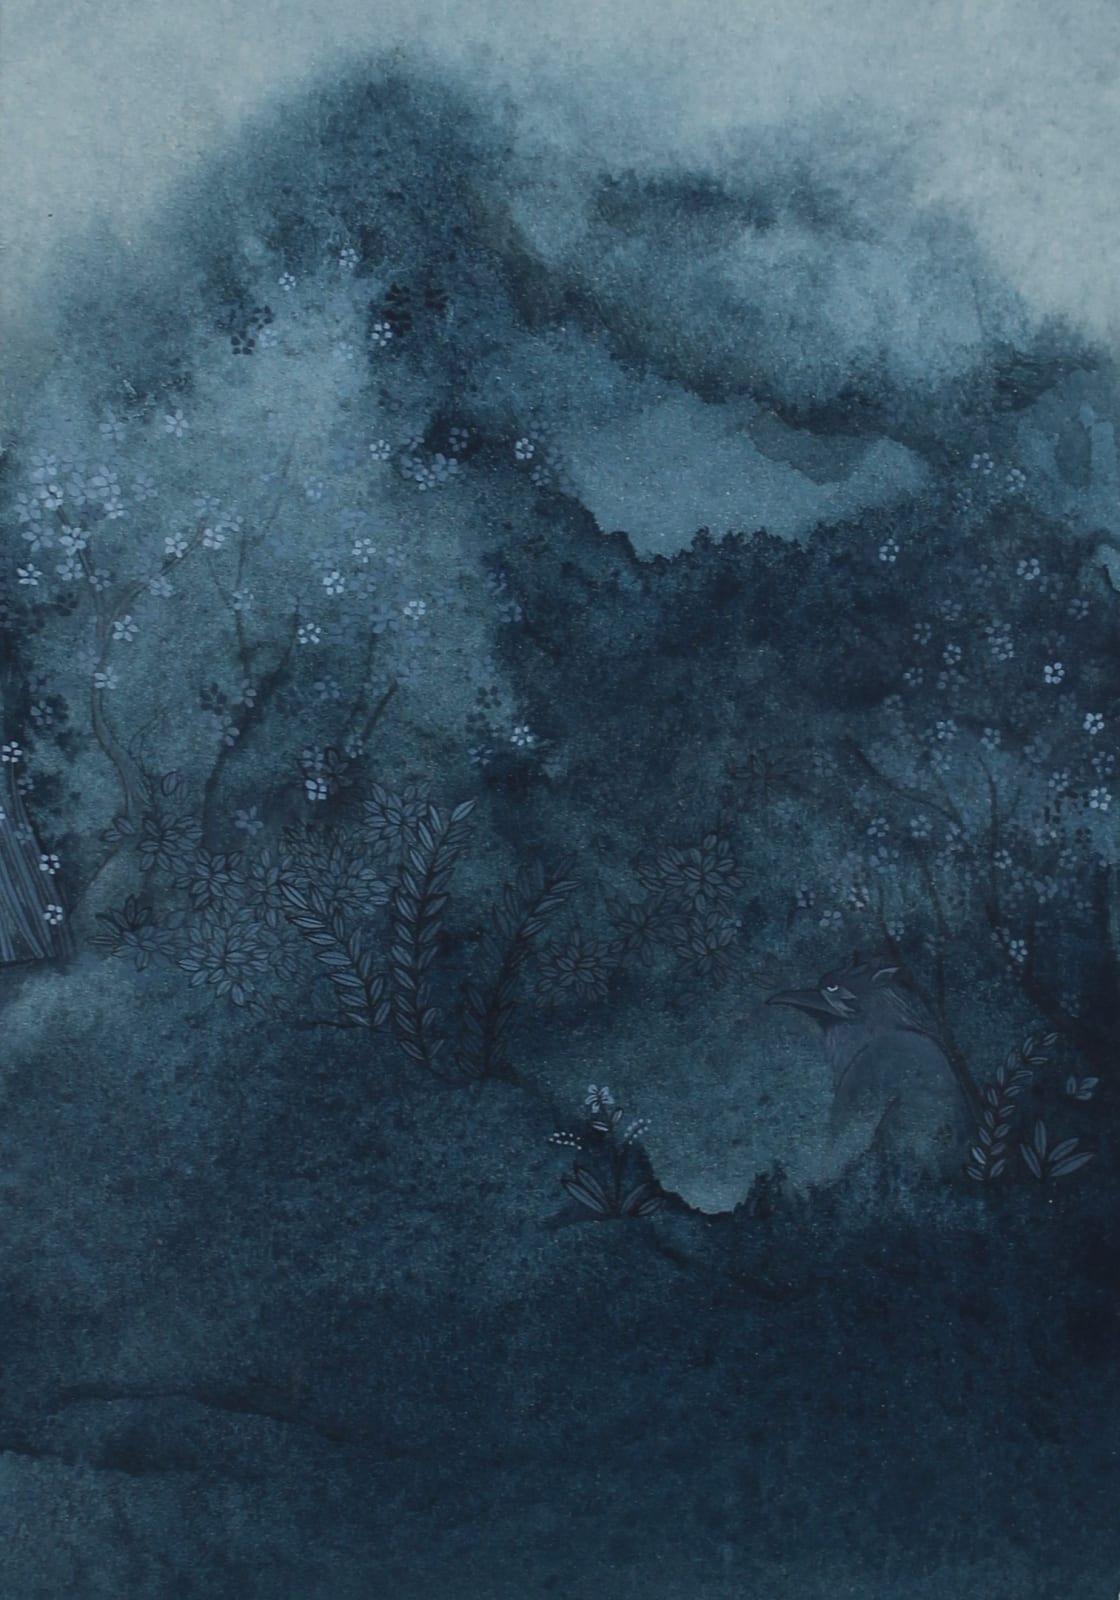 Maha Ahmed, A Piece of Stolen Sky, 2019 Gouache on paper 15.5 x 10.5 cm